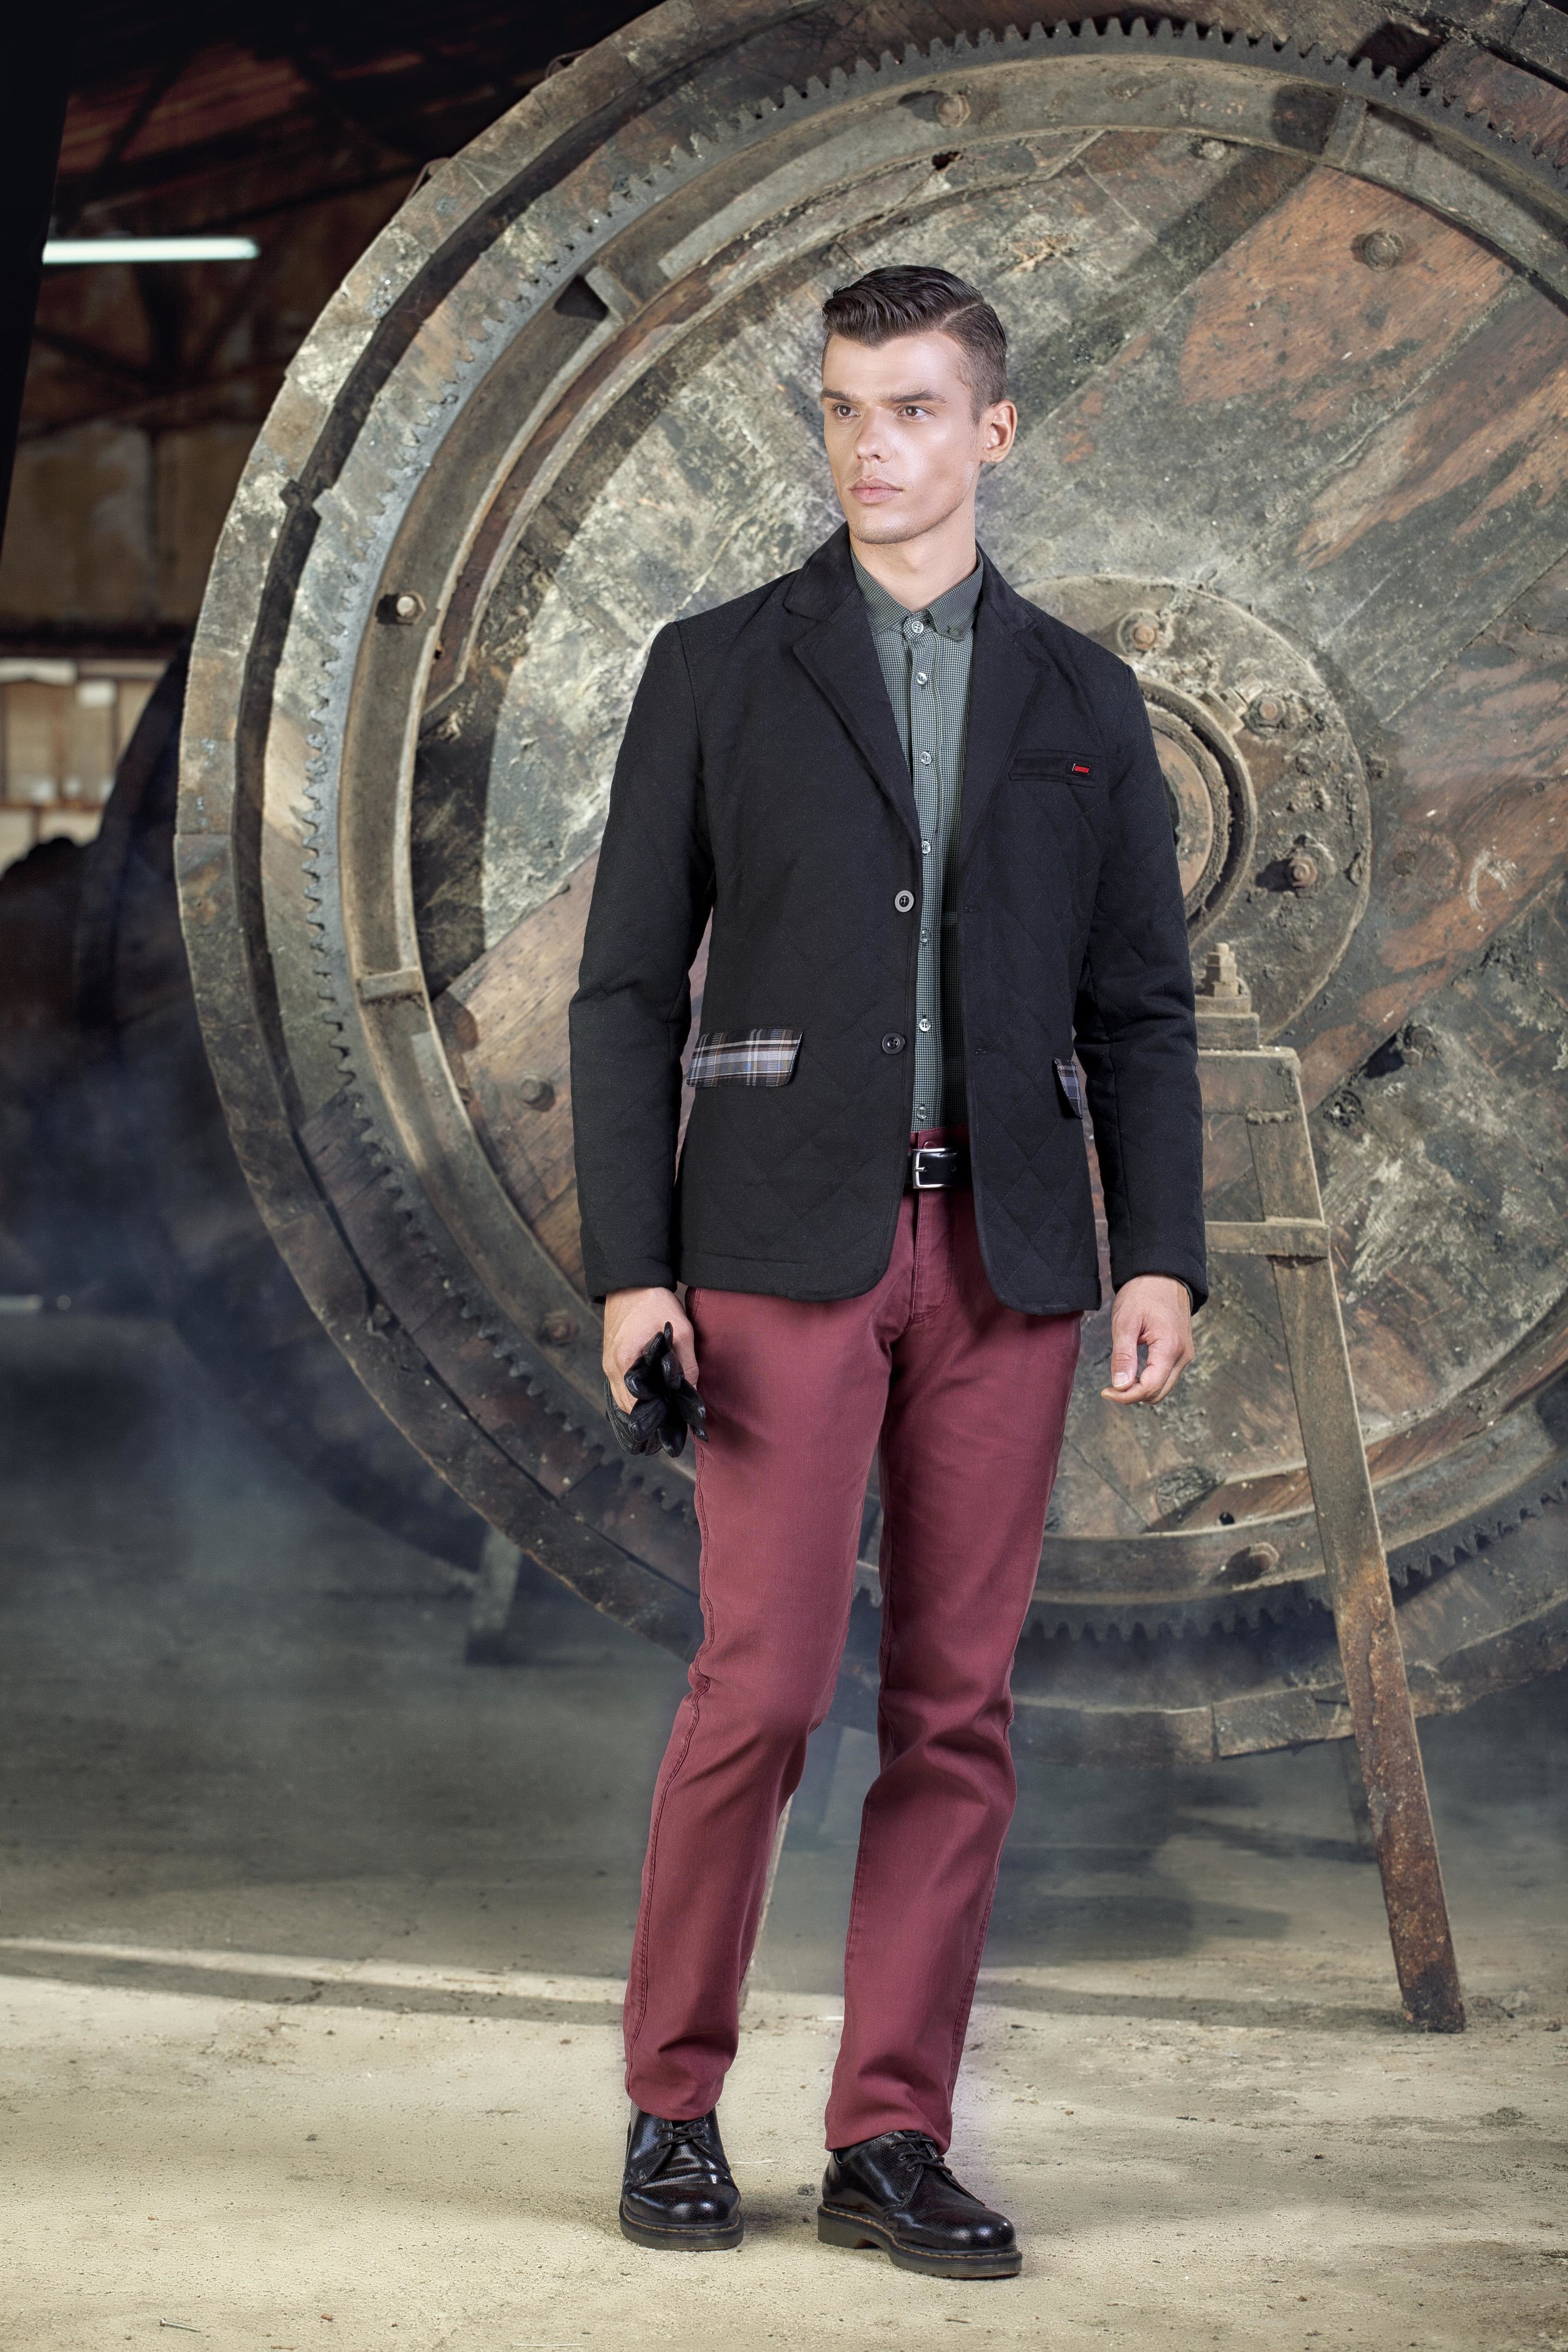 Ugur_Bektas_Fashion_Moda_fotograf_Set_7_005.jpg